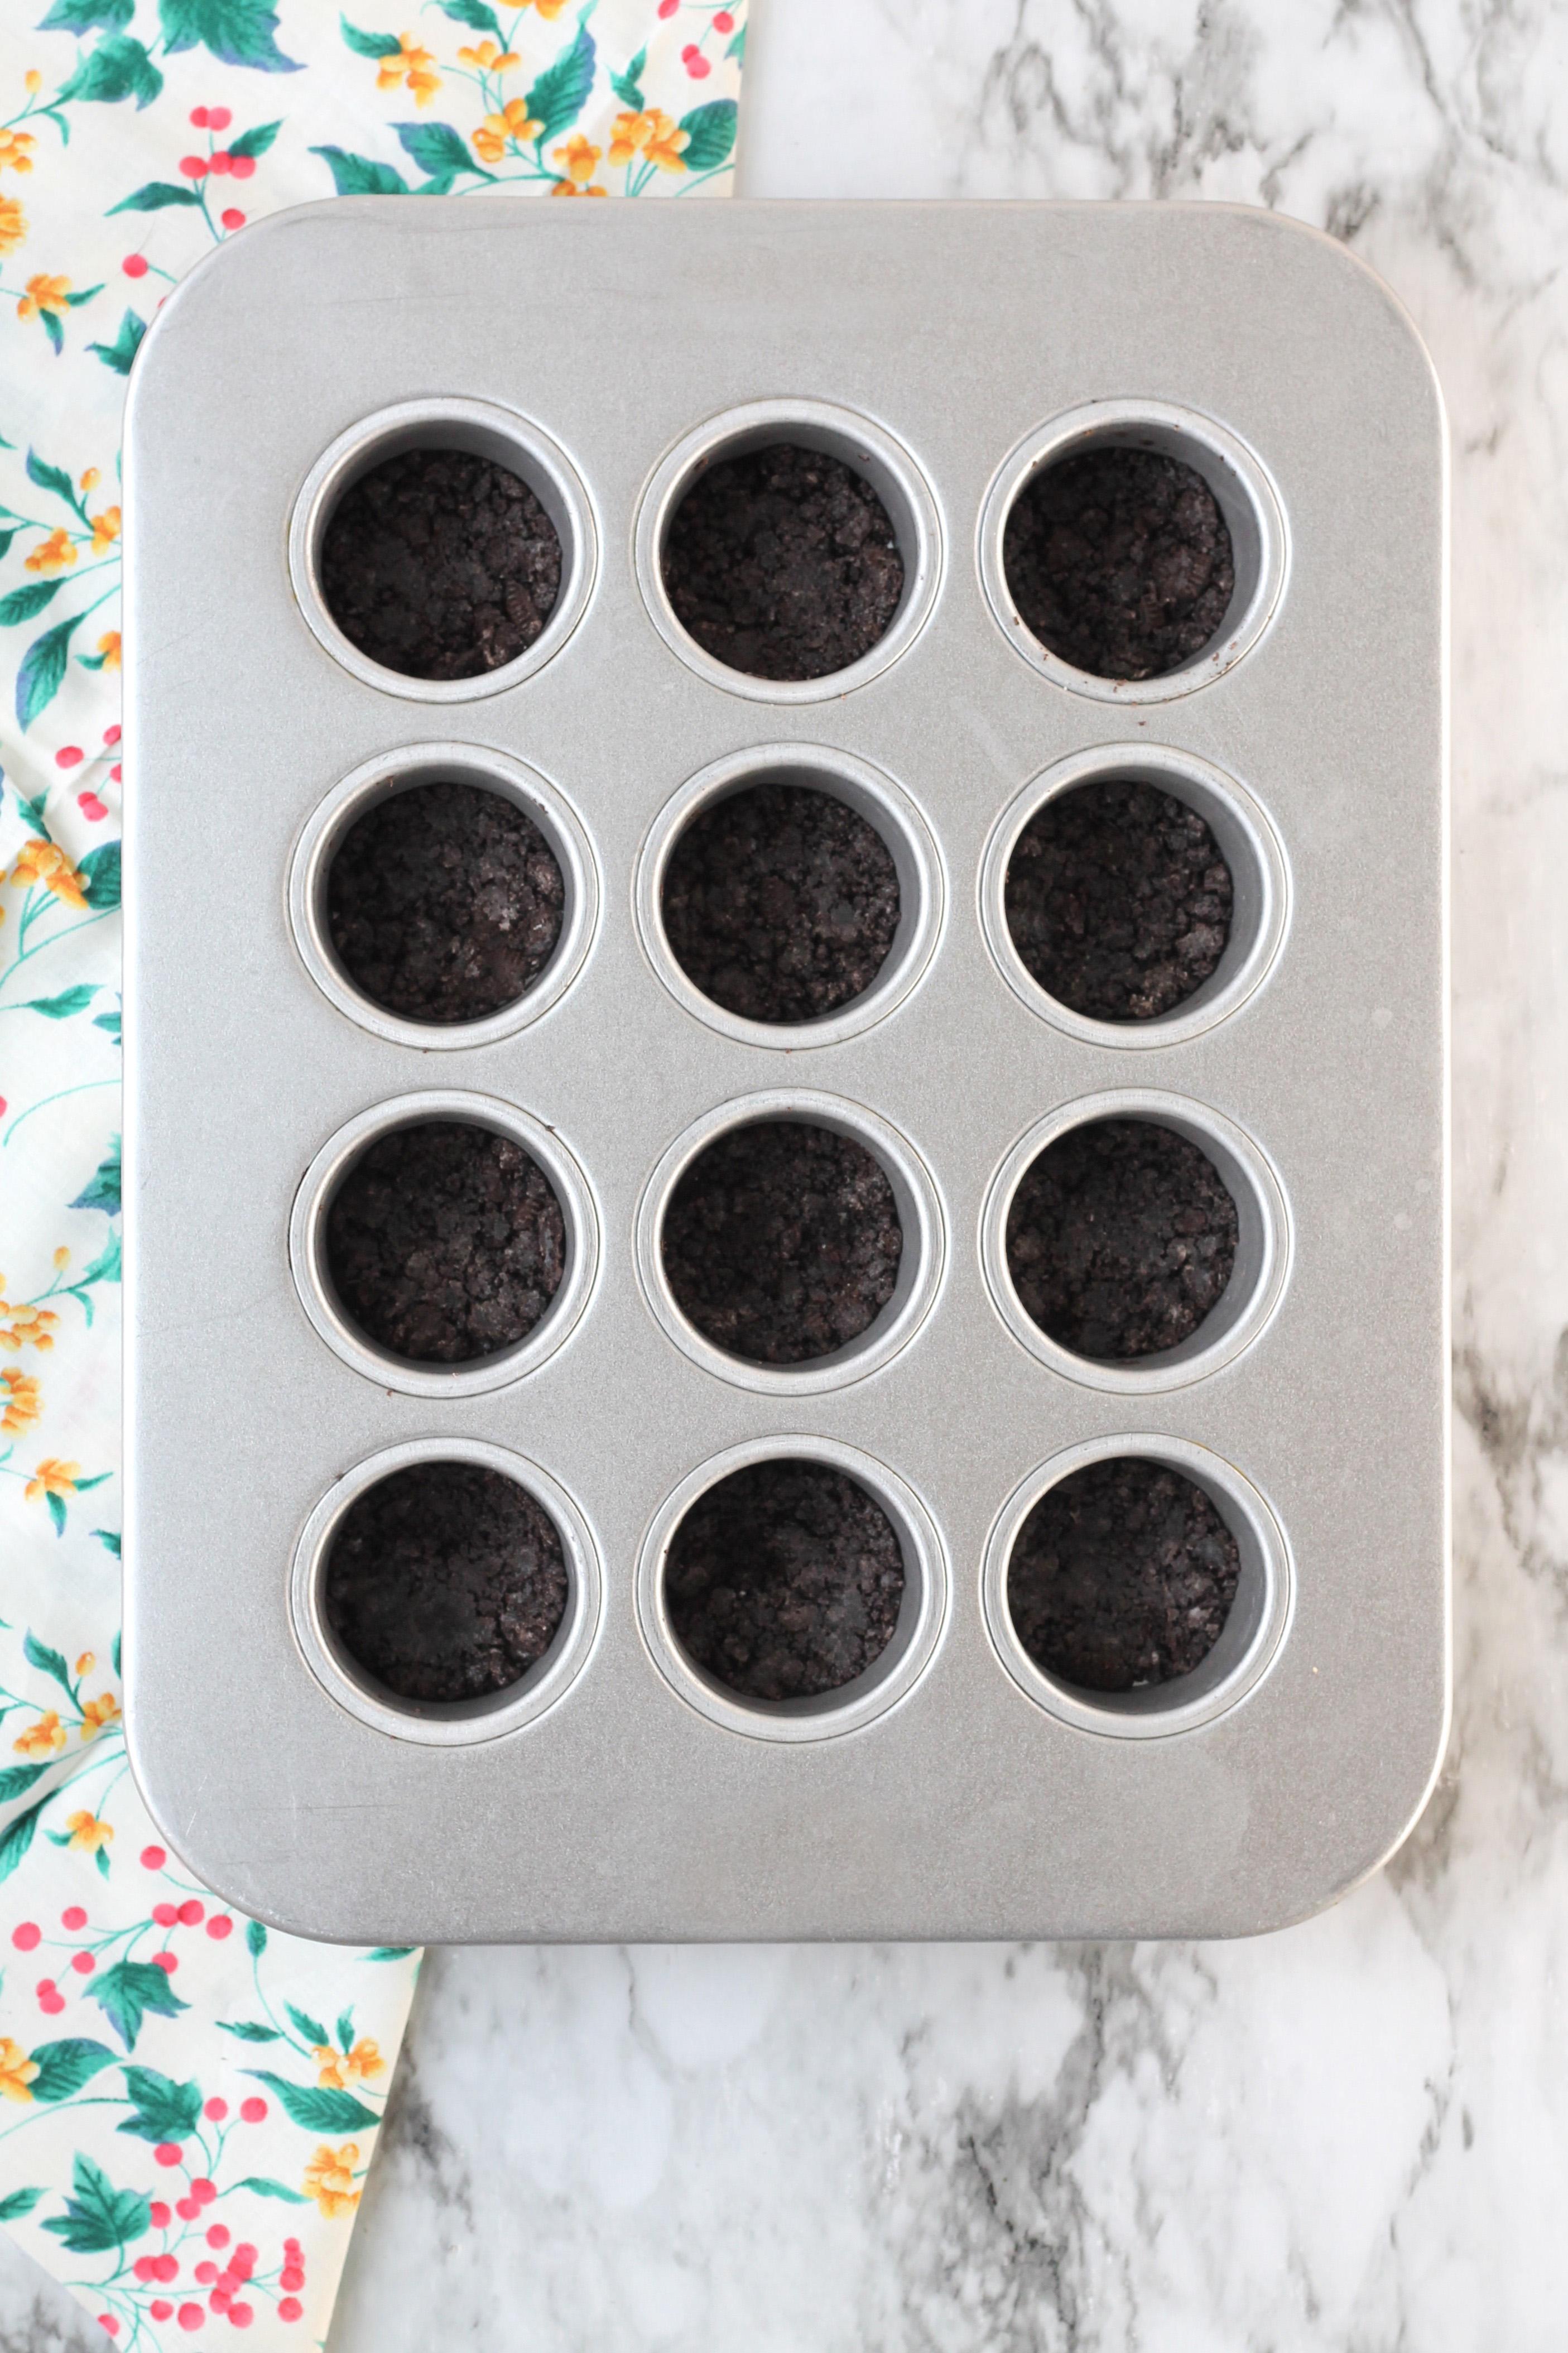 Mini Cheesecake Pan with chocolate crust